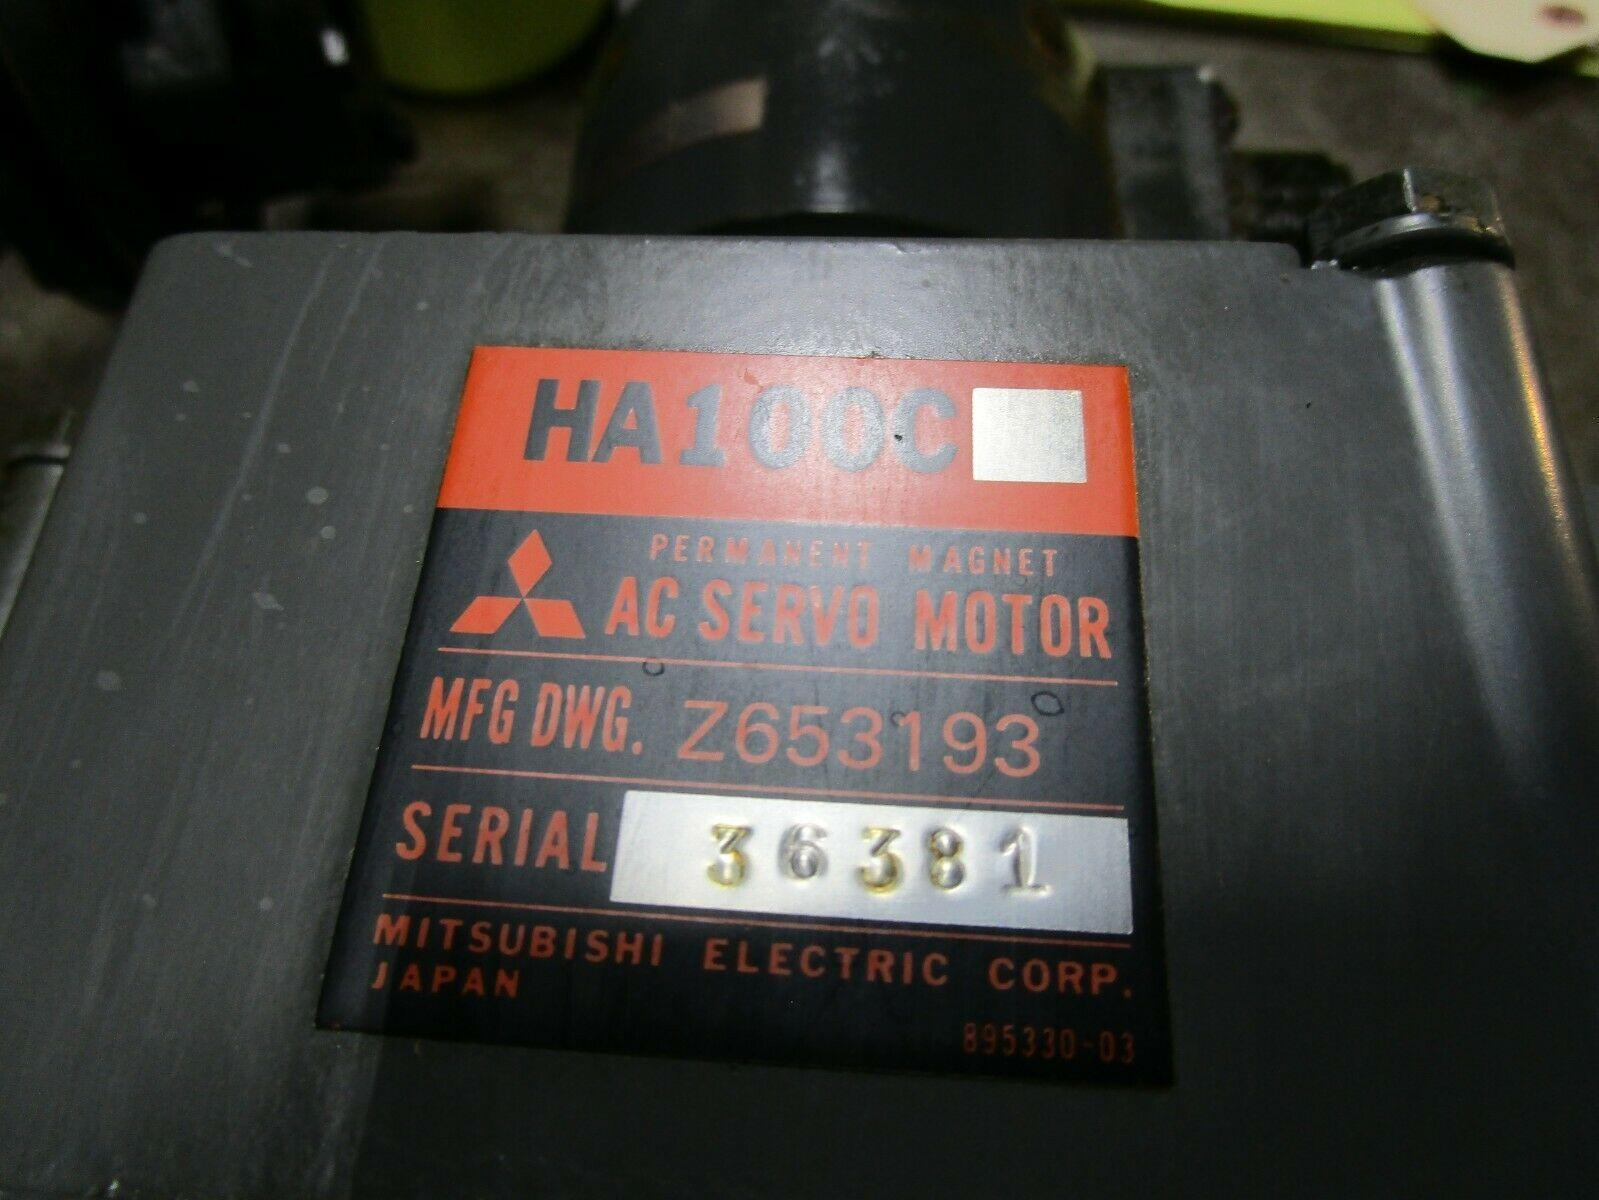 Mitsubishi Axis Motor Servo Motor HA100C Z653193